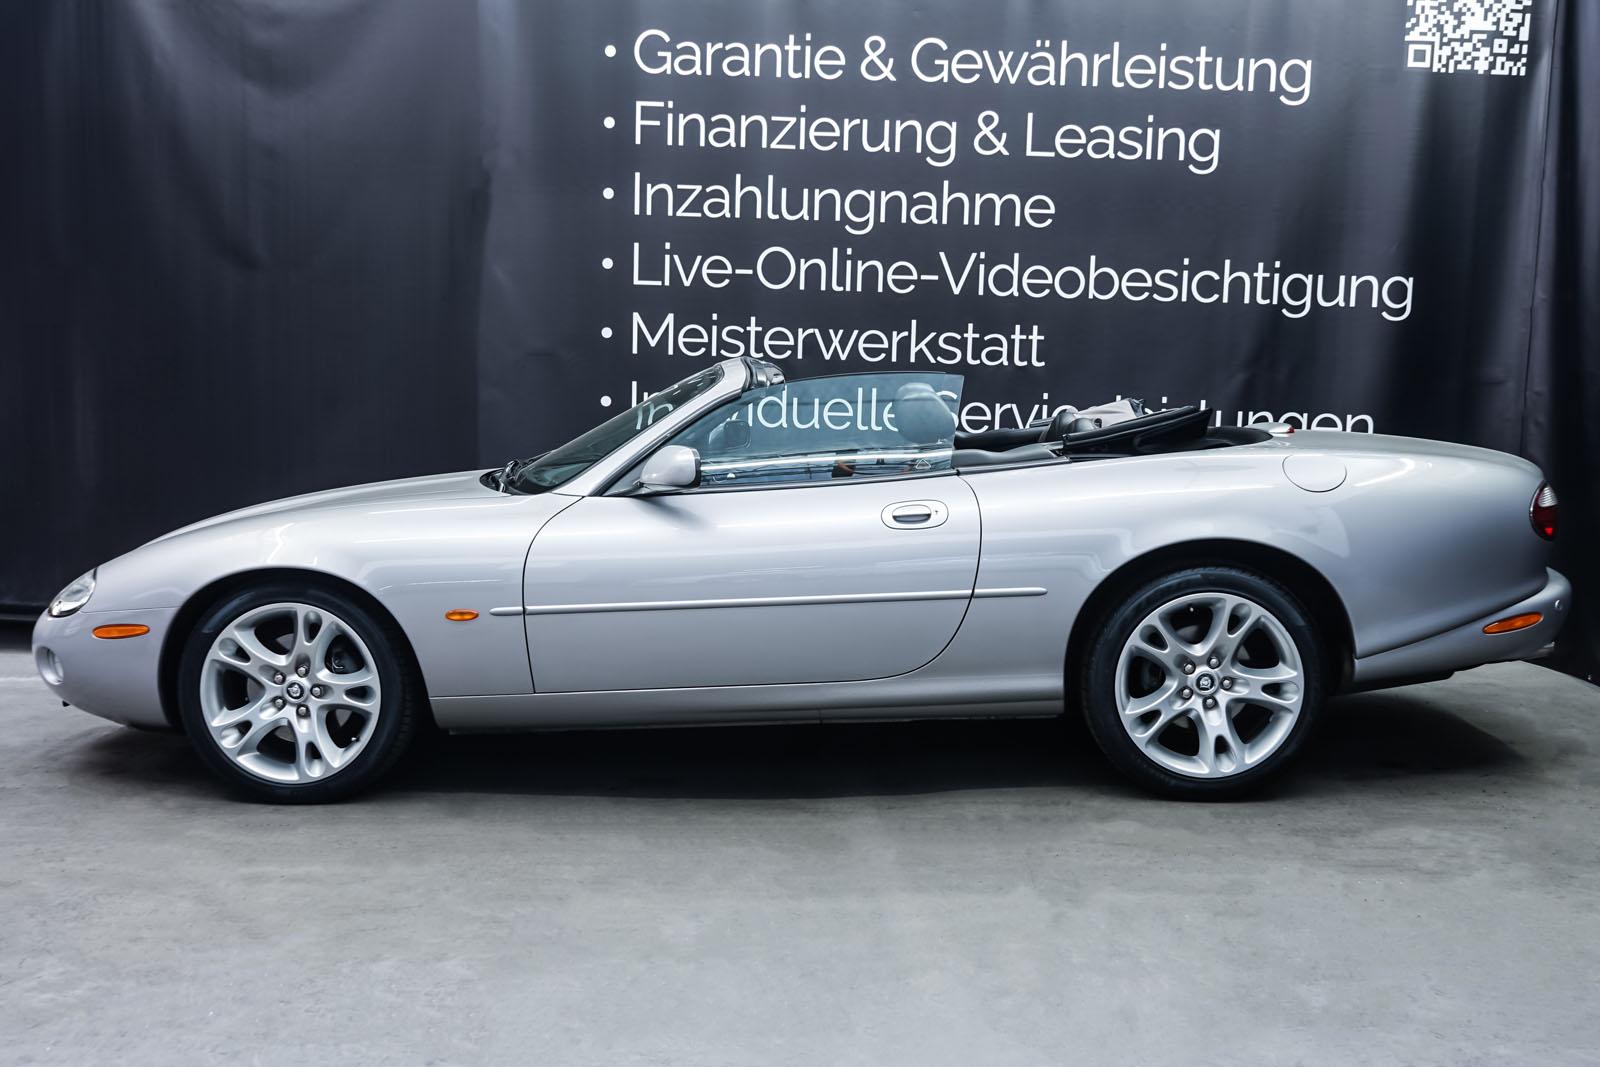 Jaguar_XK8_4.0_Silber_Schwarz_JAG-9731_6_w